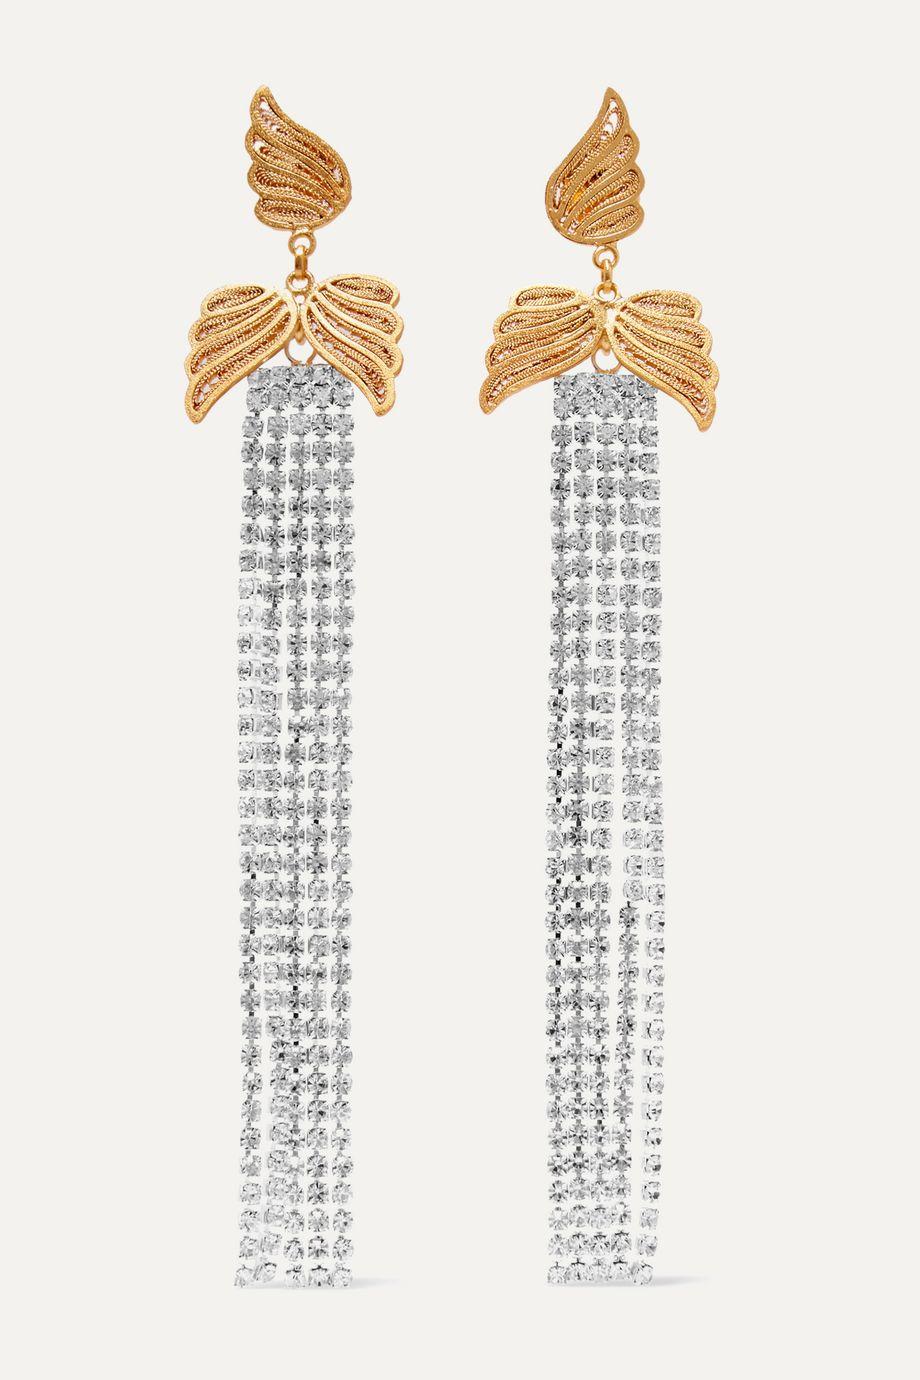 Mallarino Eloise gold-tone crystal earrings